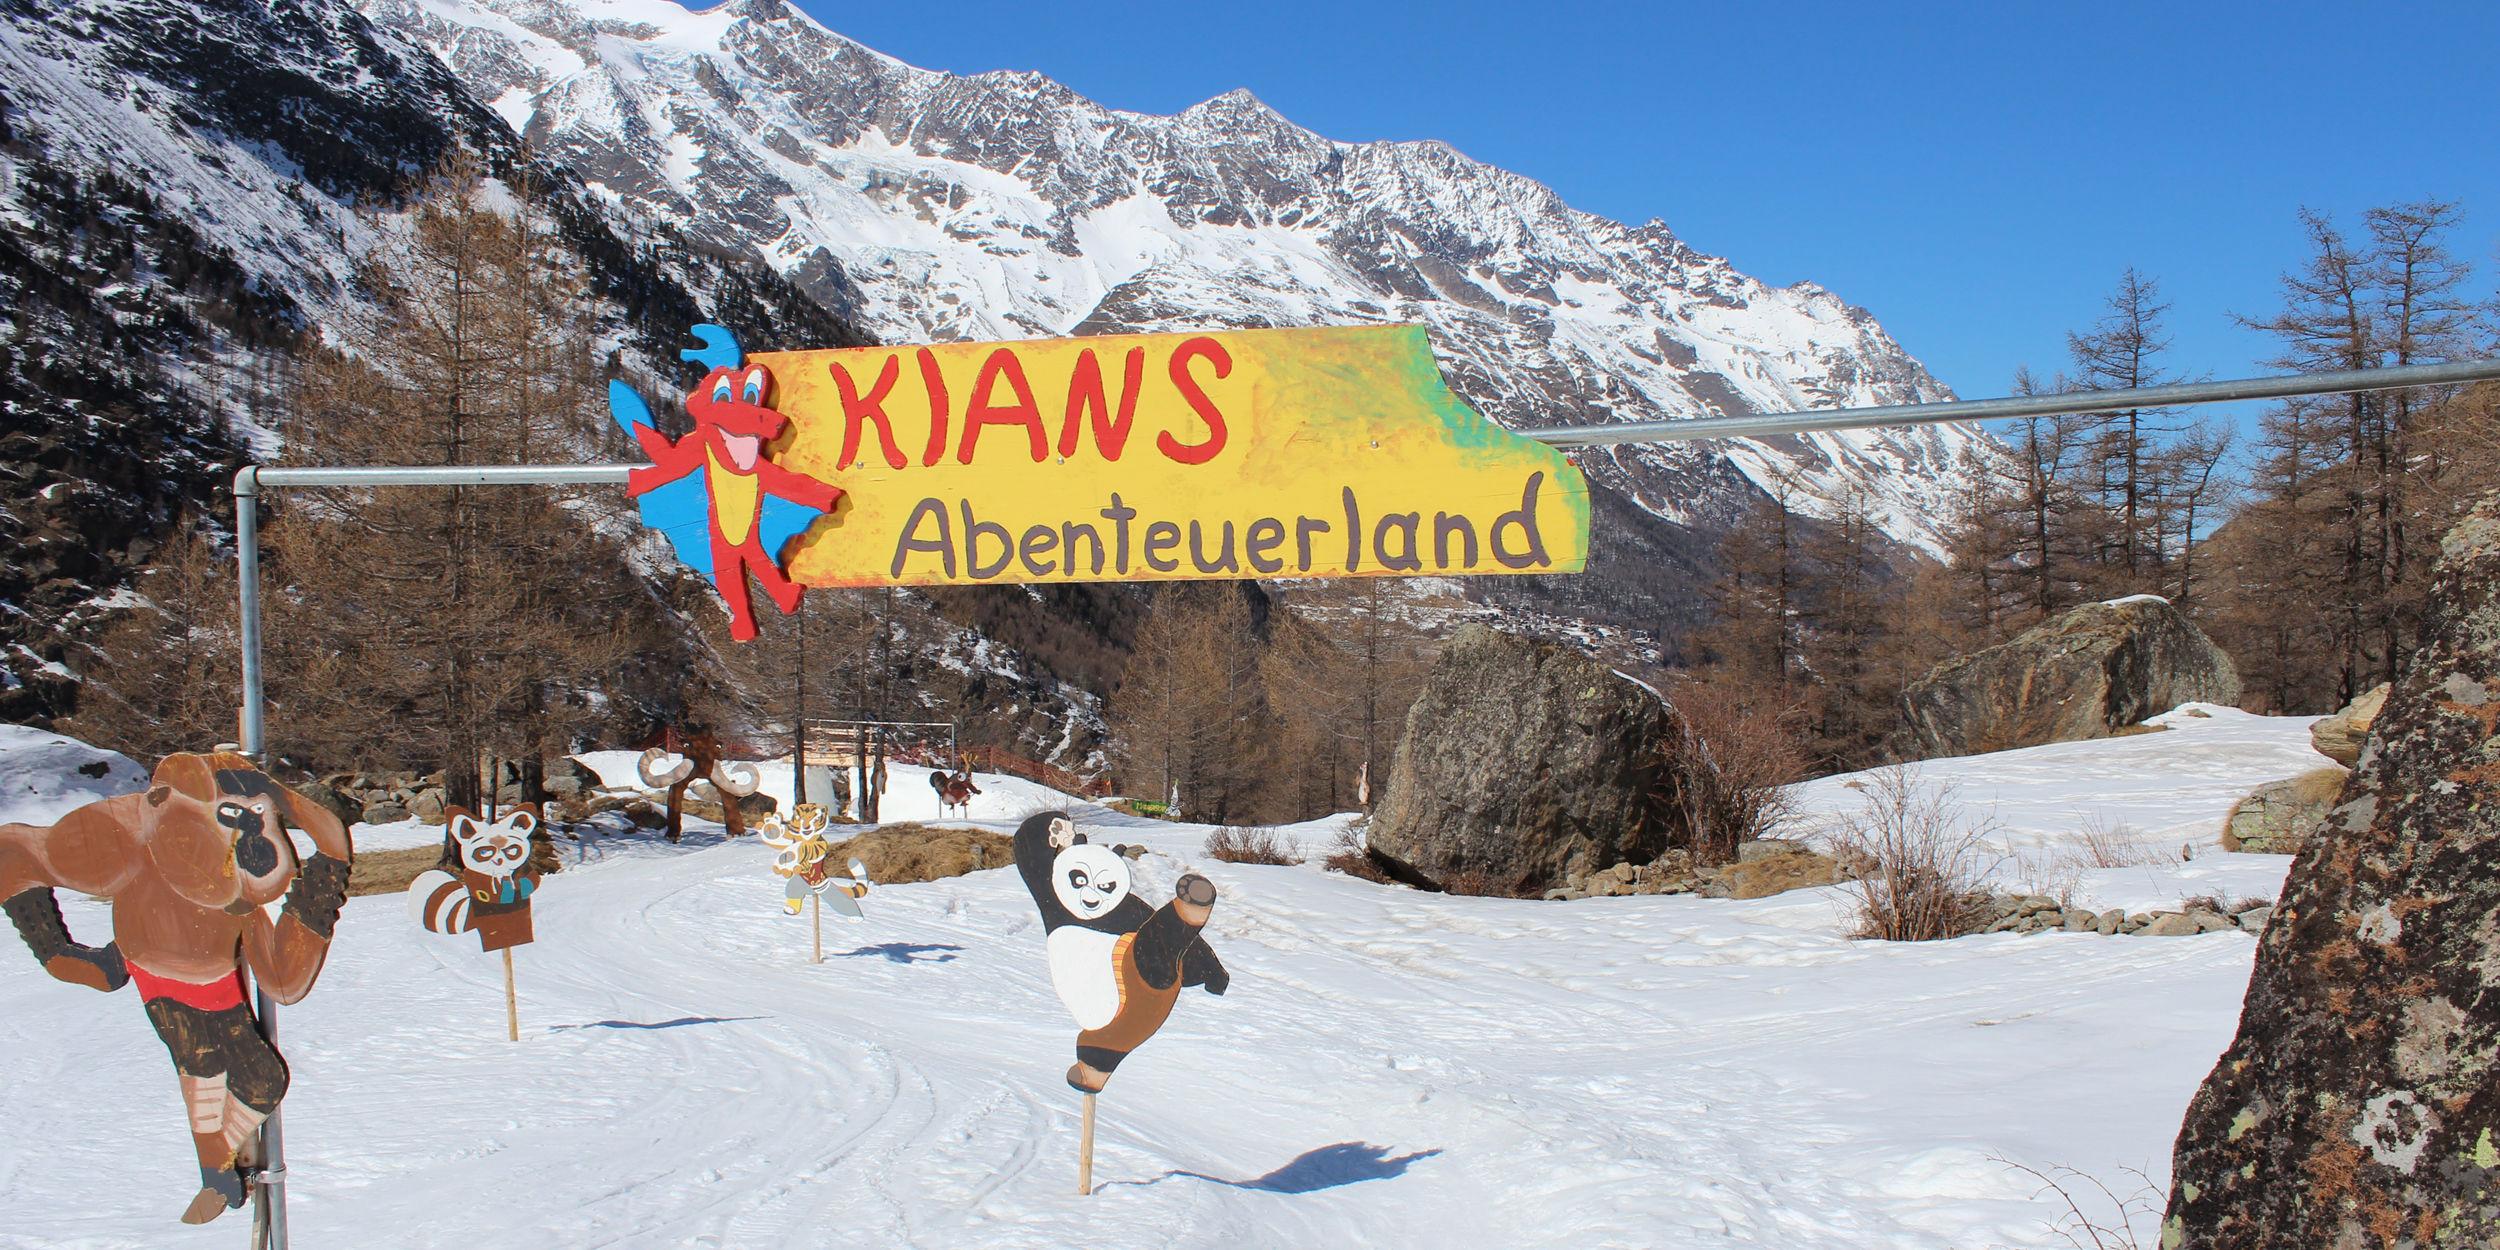 Kian's Abenteuerland in der Freien Ferienrepublik Saas-Fee